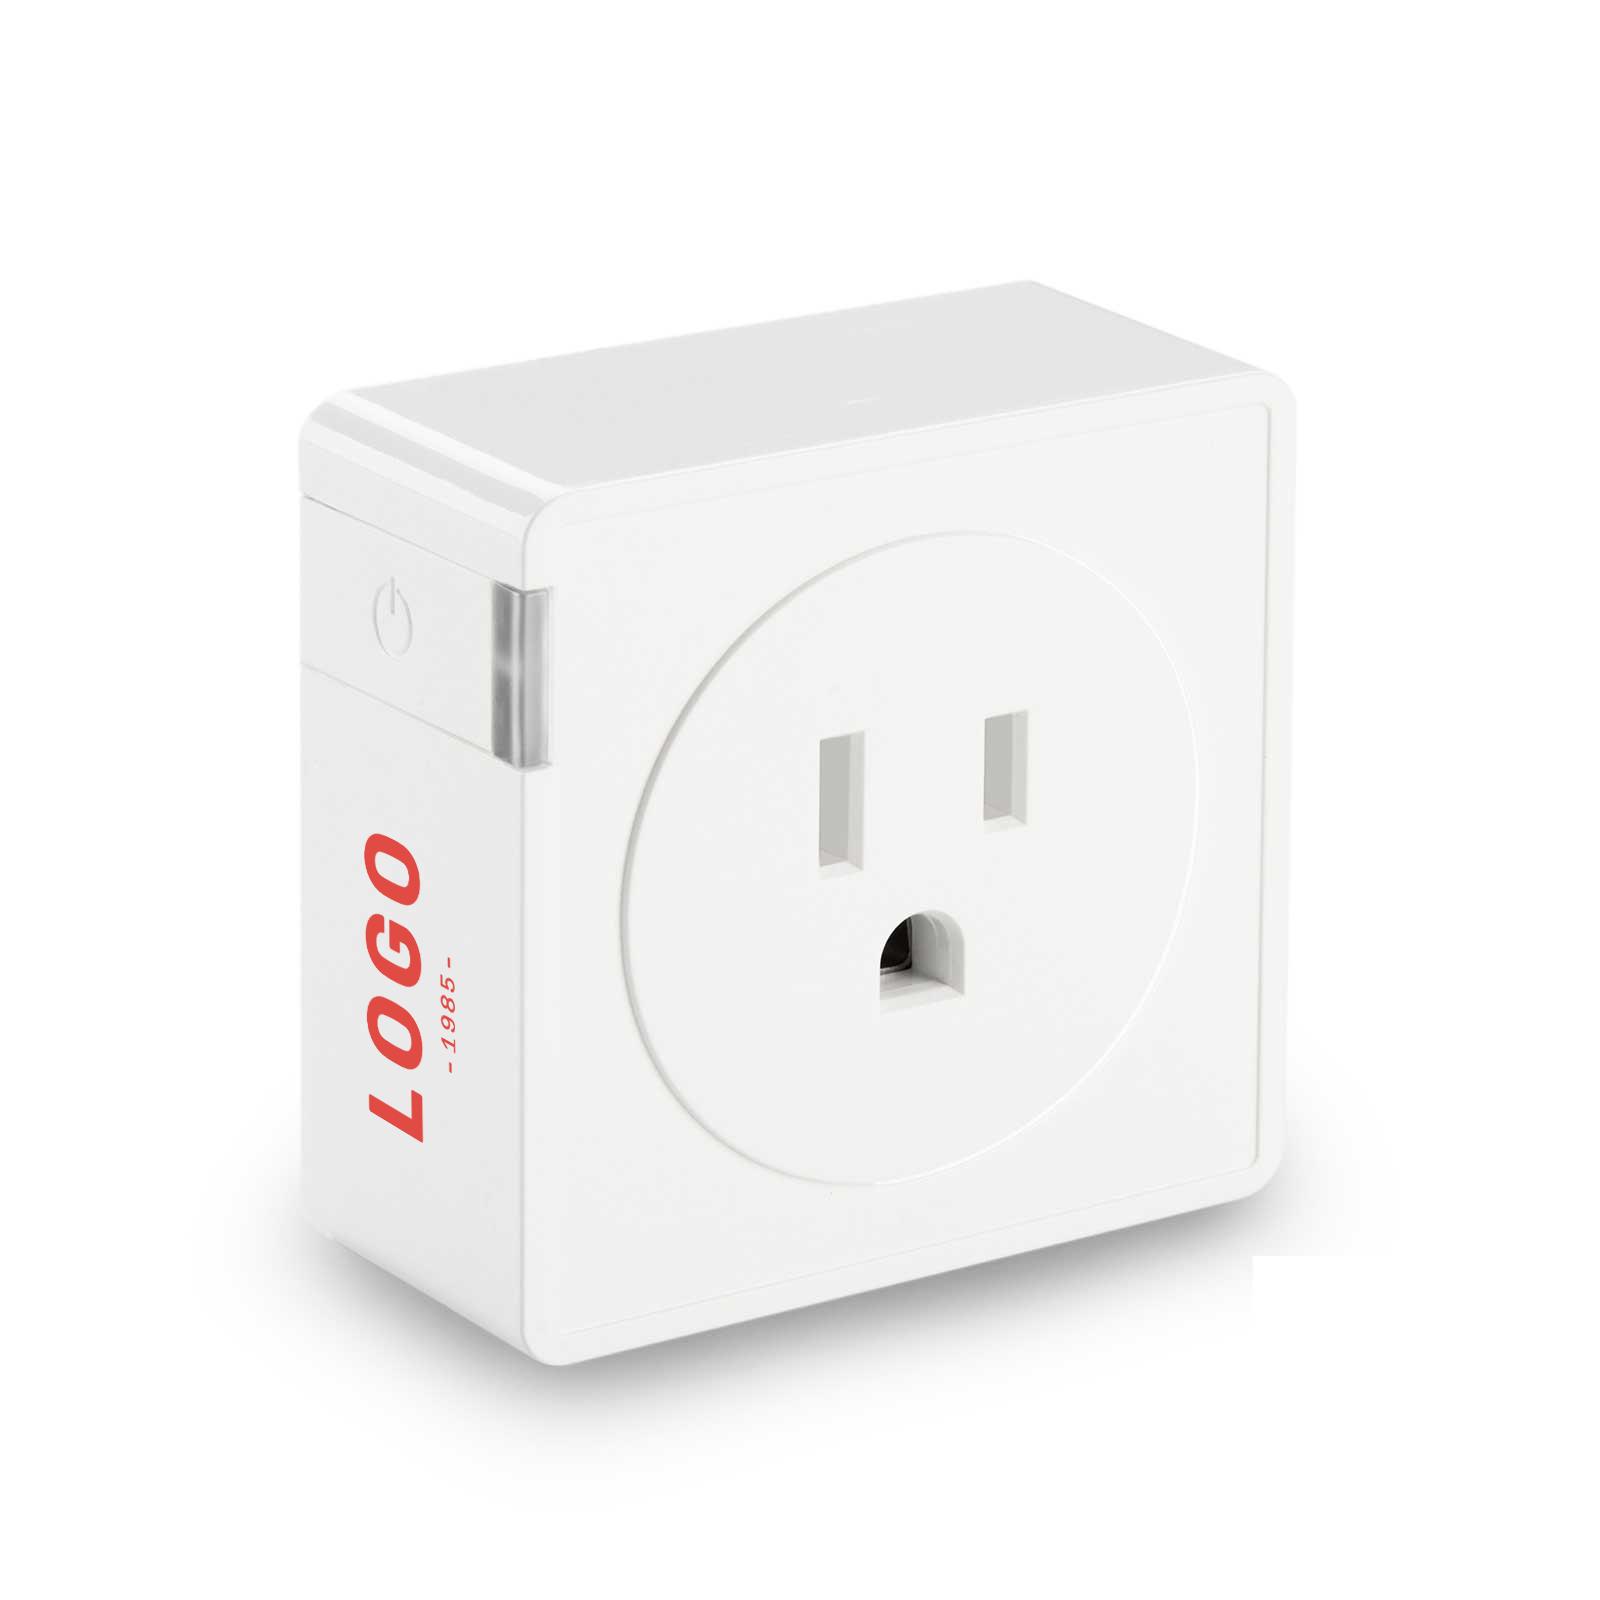 130183 genius smart plug one color imprint